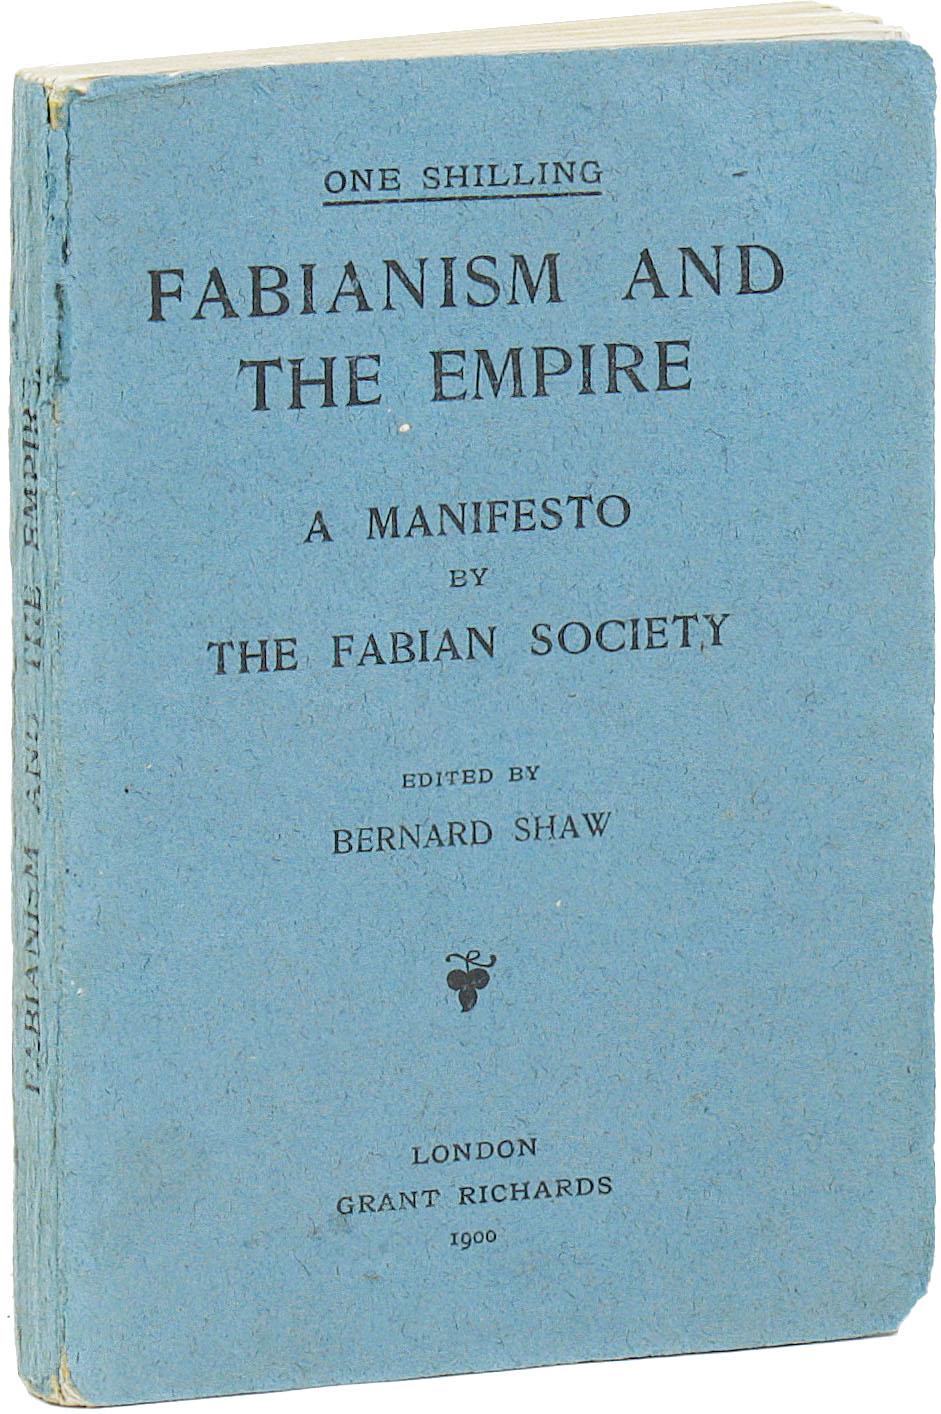 Fabianism and the Empire: A Manifesto by The Fabian Society. FABIANS,  George Bernard